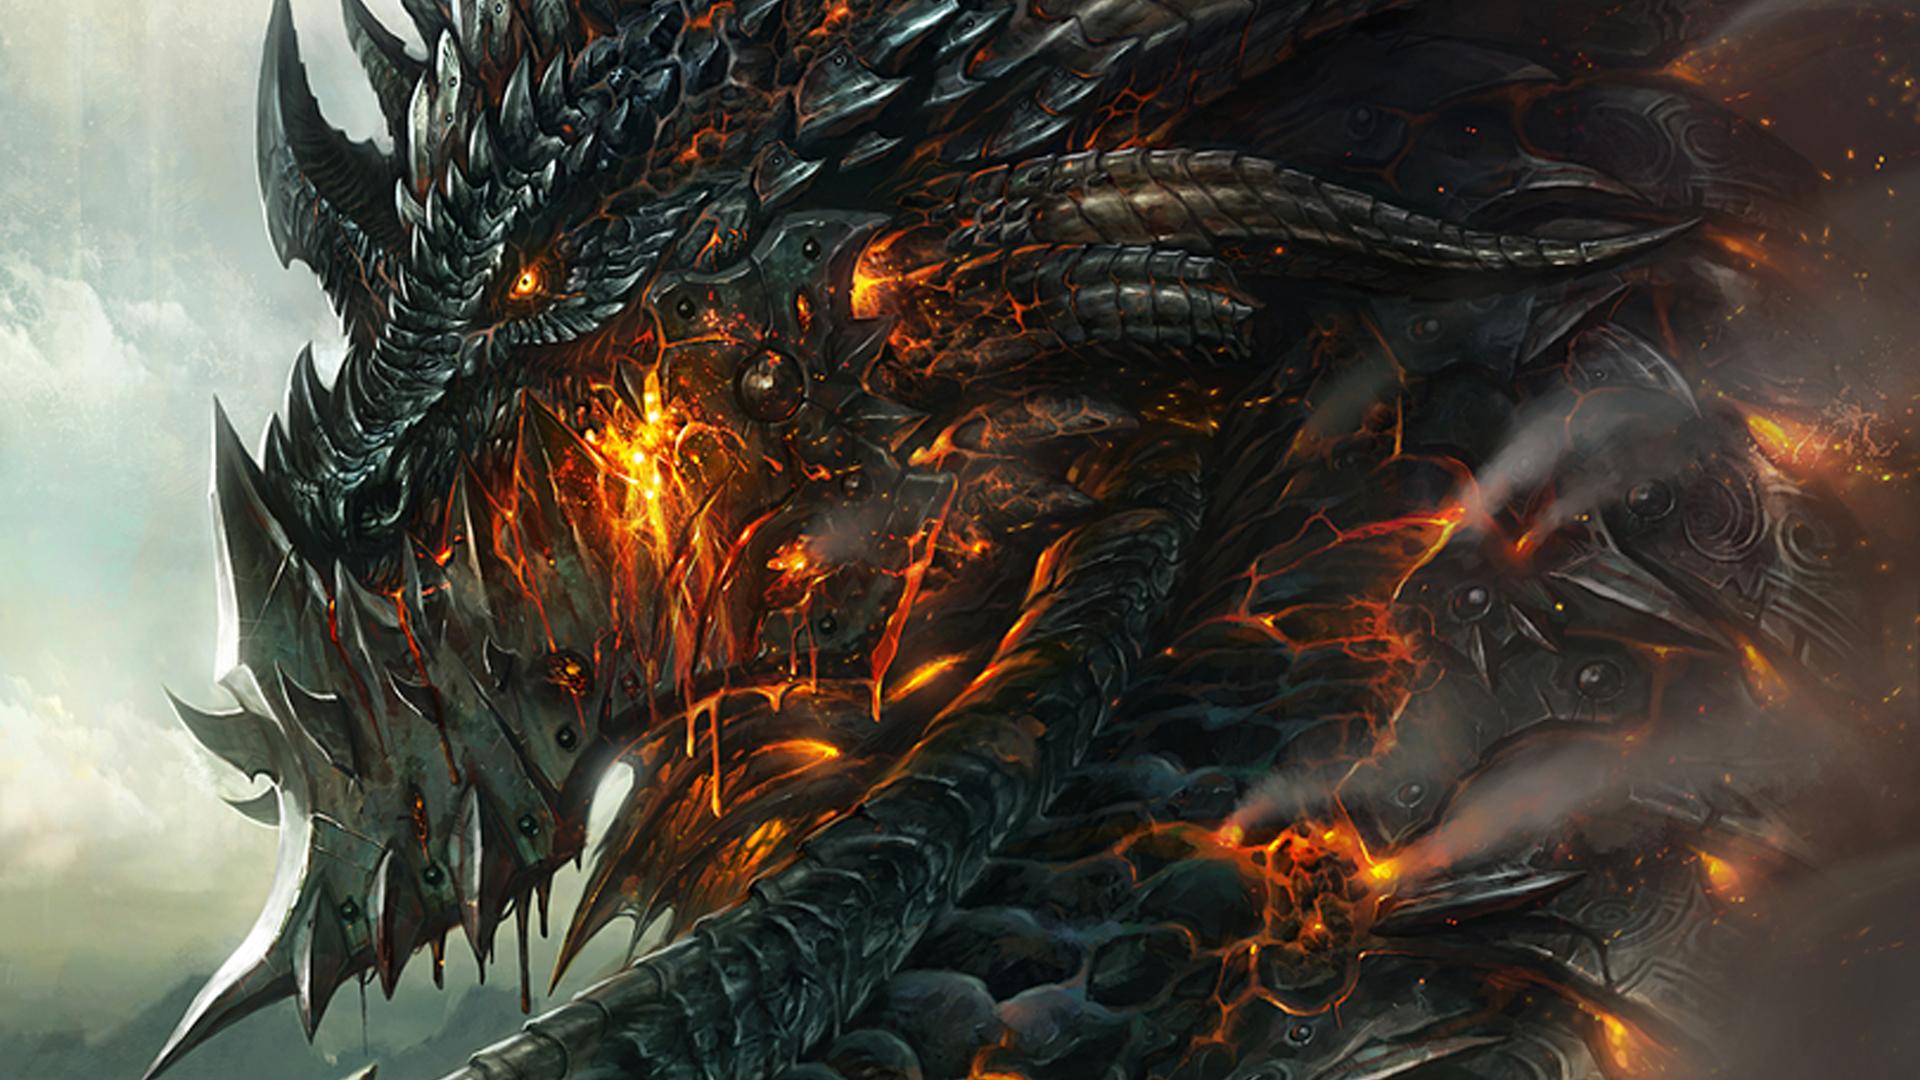 WoW Dragon Wallpaper 1 By Badass Wallpapers Hd